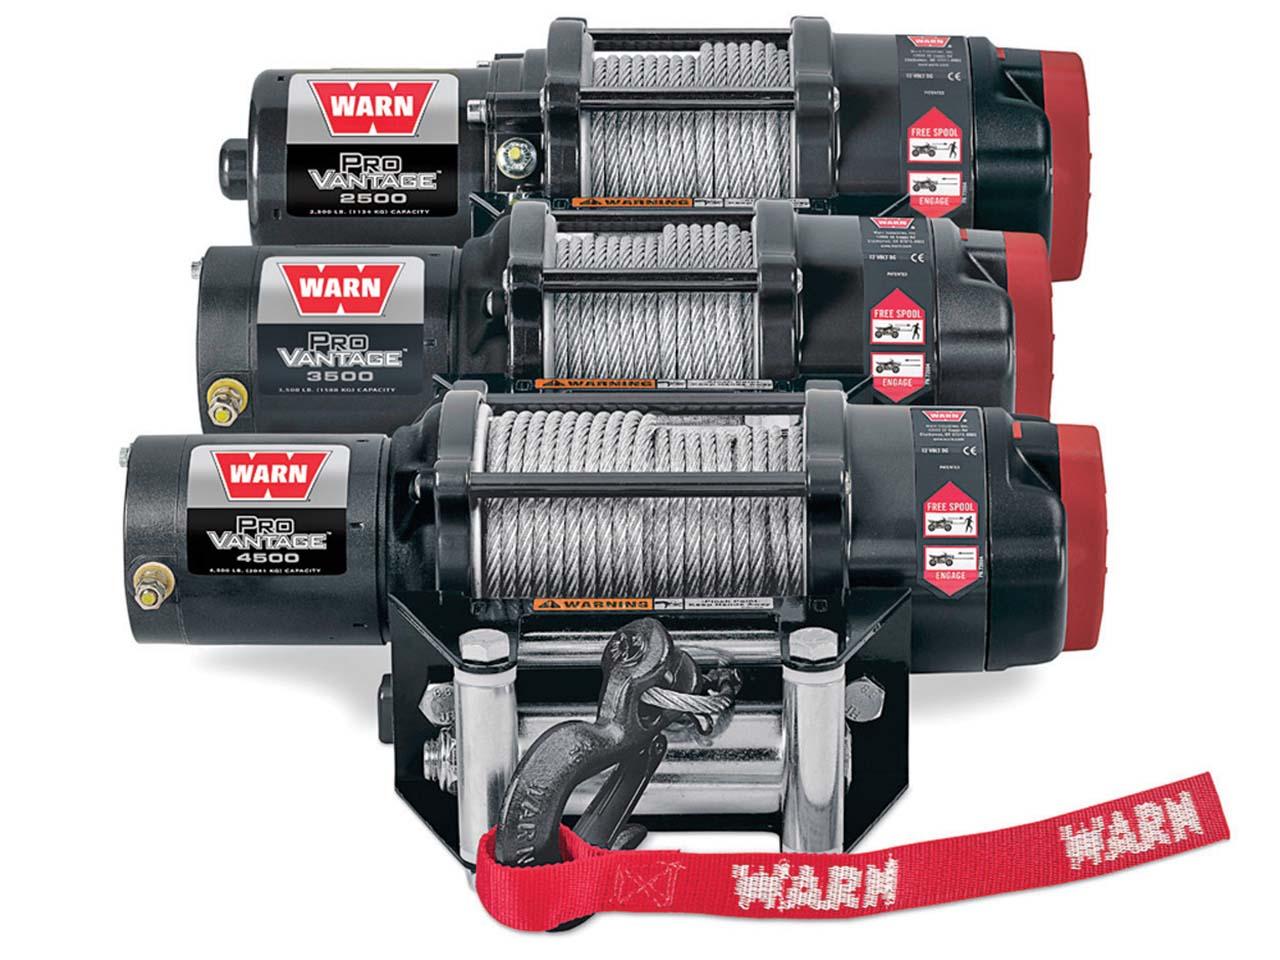 warn winch 2000 harley davidson fatboy wiring diagram new products 2012 atv illustrated